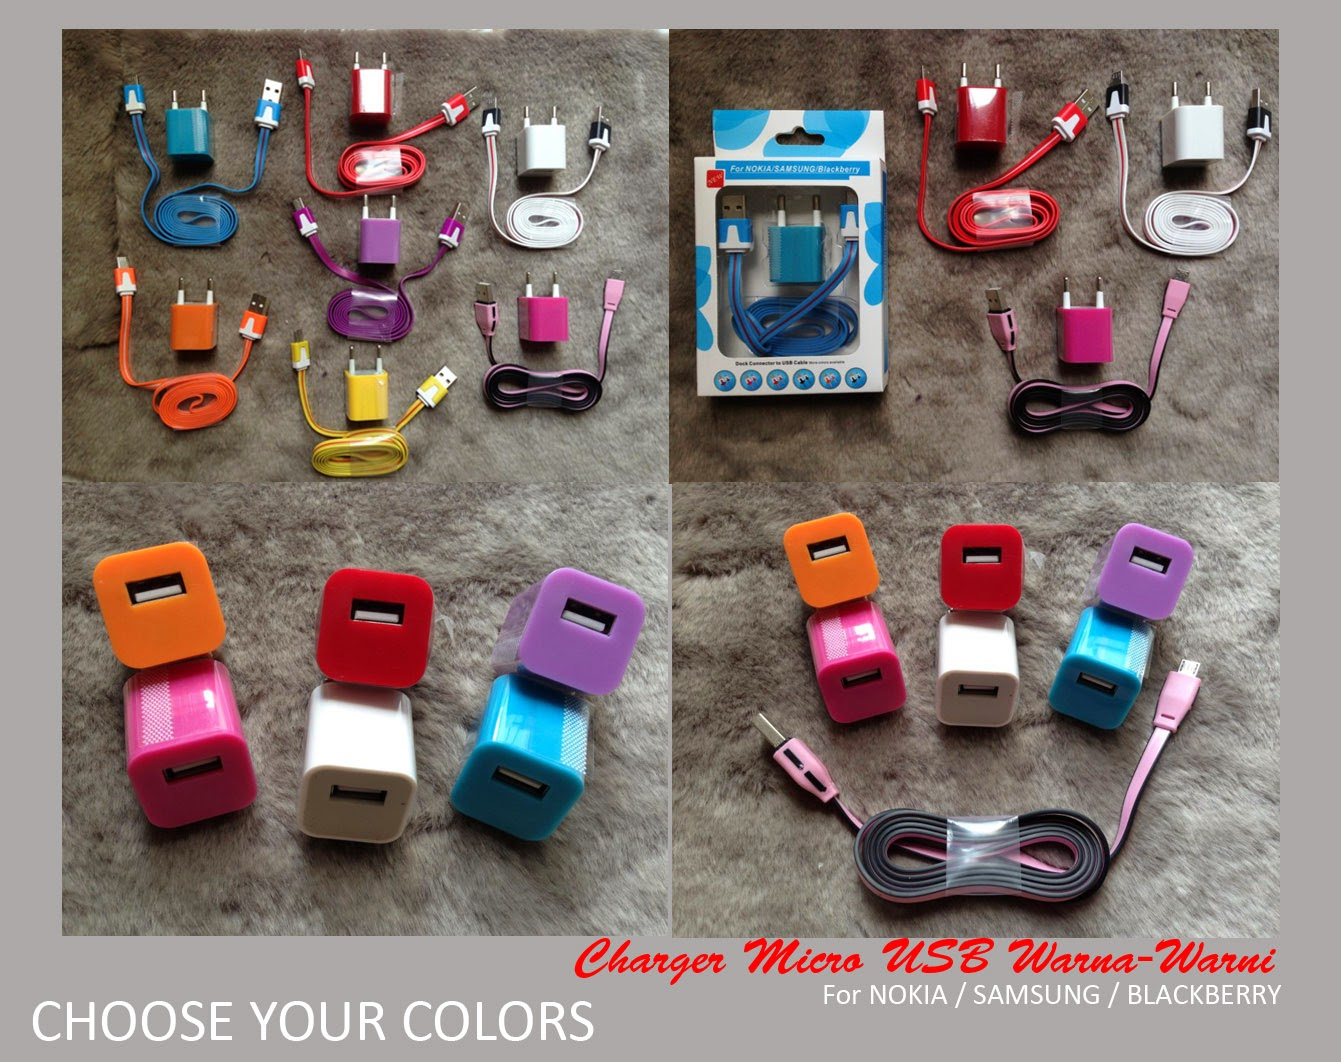 Aksesorissparepart Aneka Charger Packing Dus Blackberry Mini Usb Ori 100 Model Onyx Gemini Rim 68rb 2 99 Press 20rb